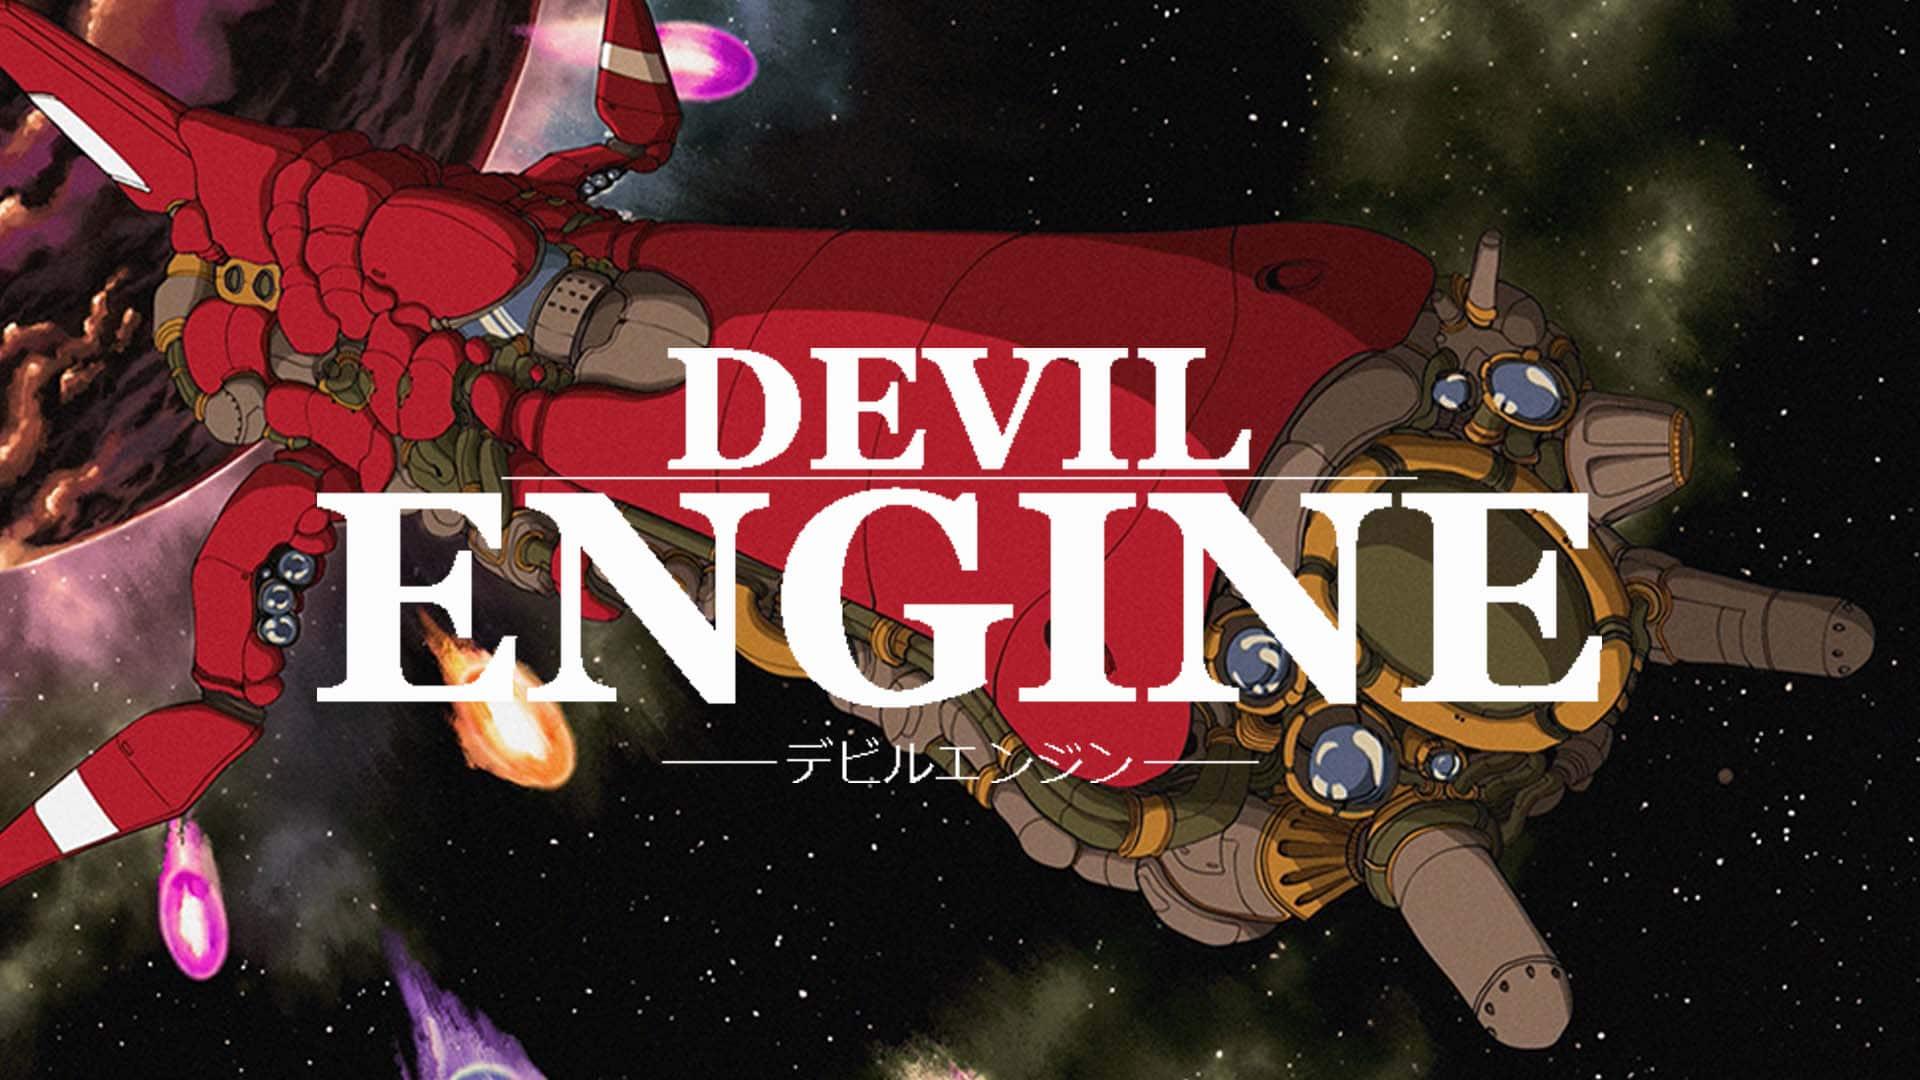 Test du jeu Devil Engine (PS4, Switch, PC) - M2 Gaming